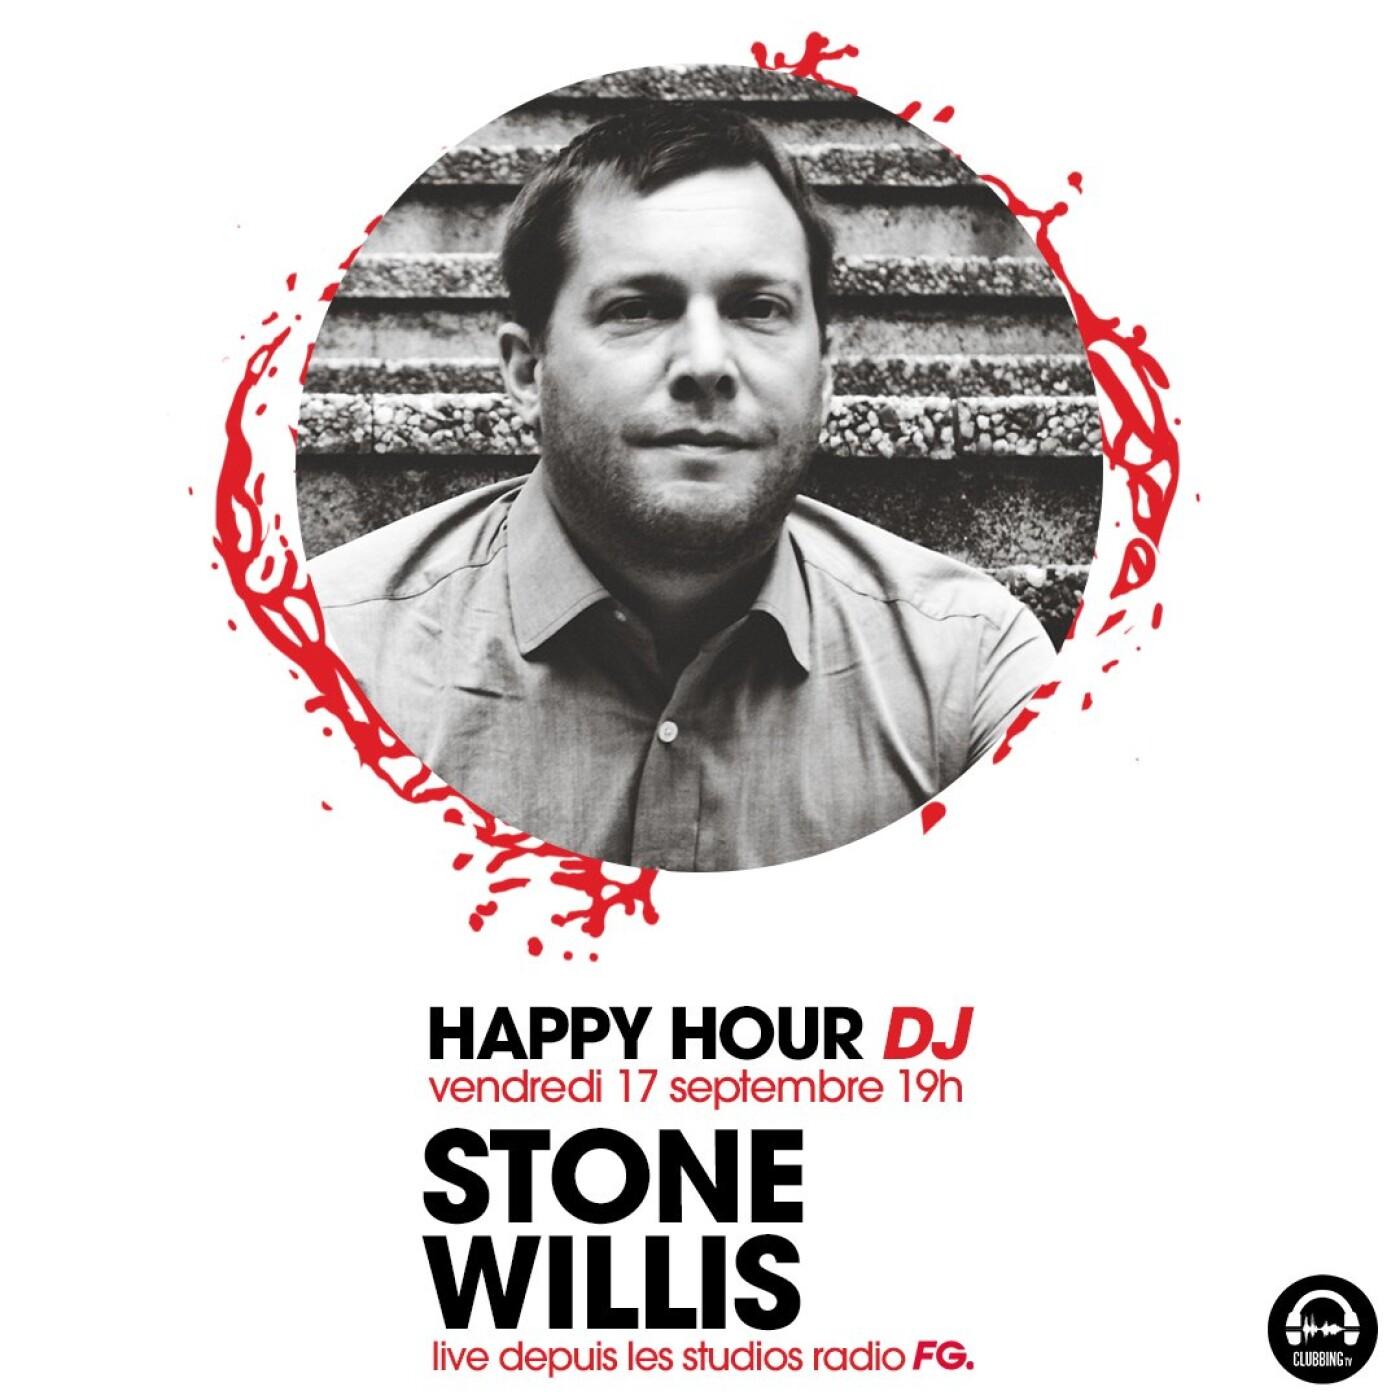 HAPPY HOUR DJ : STONE WILLIS